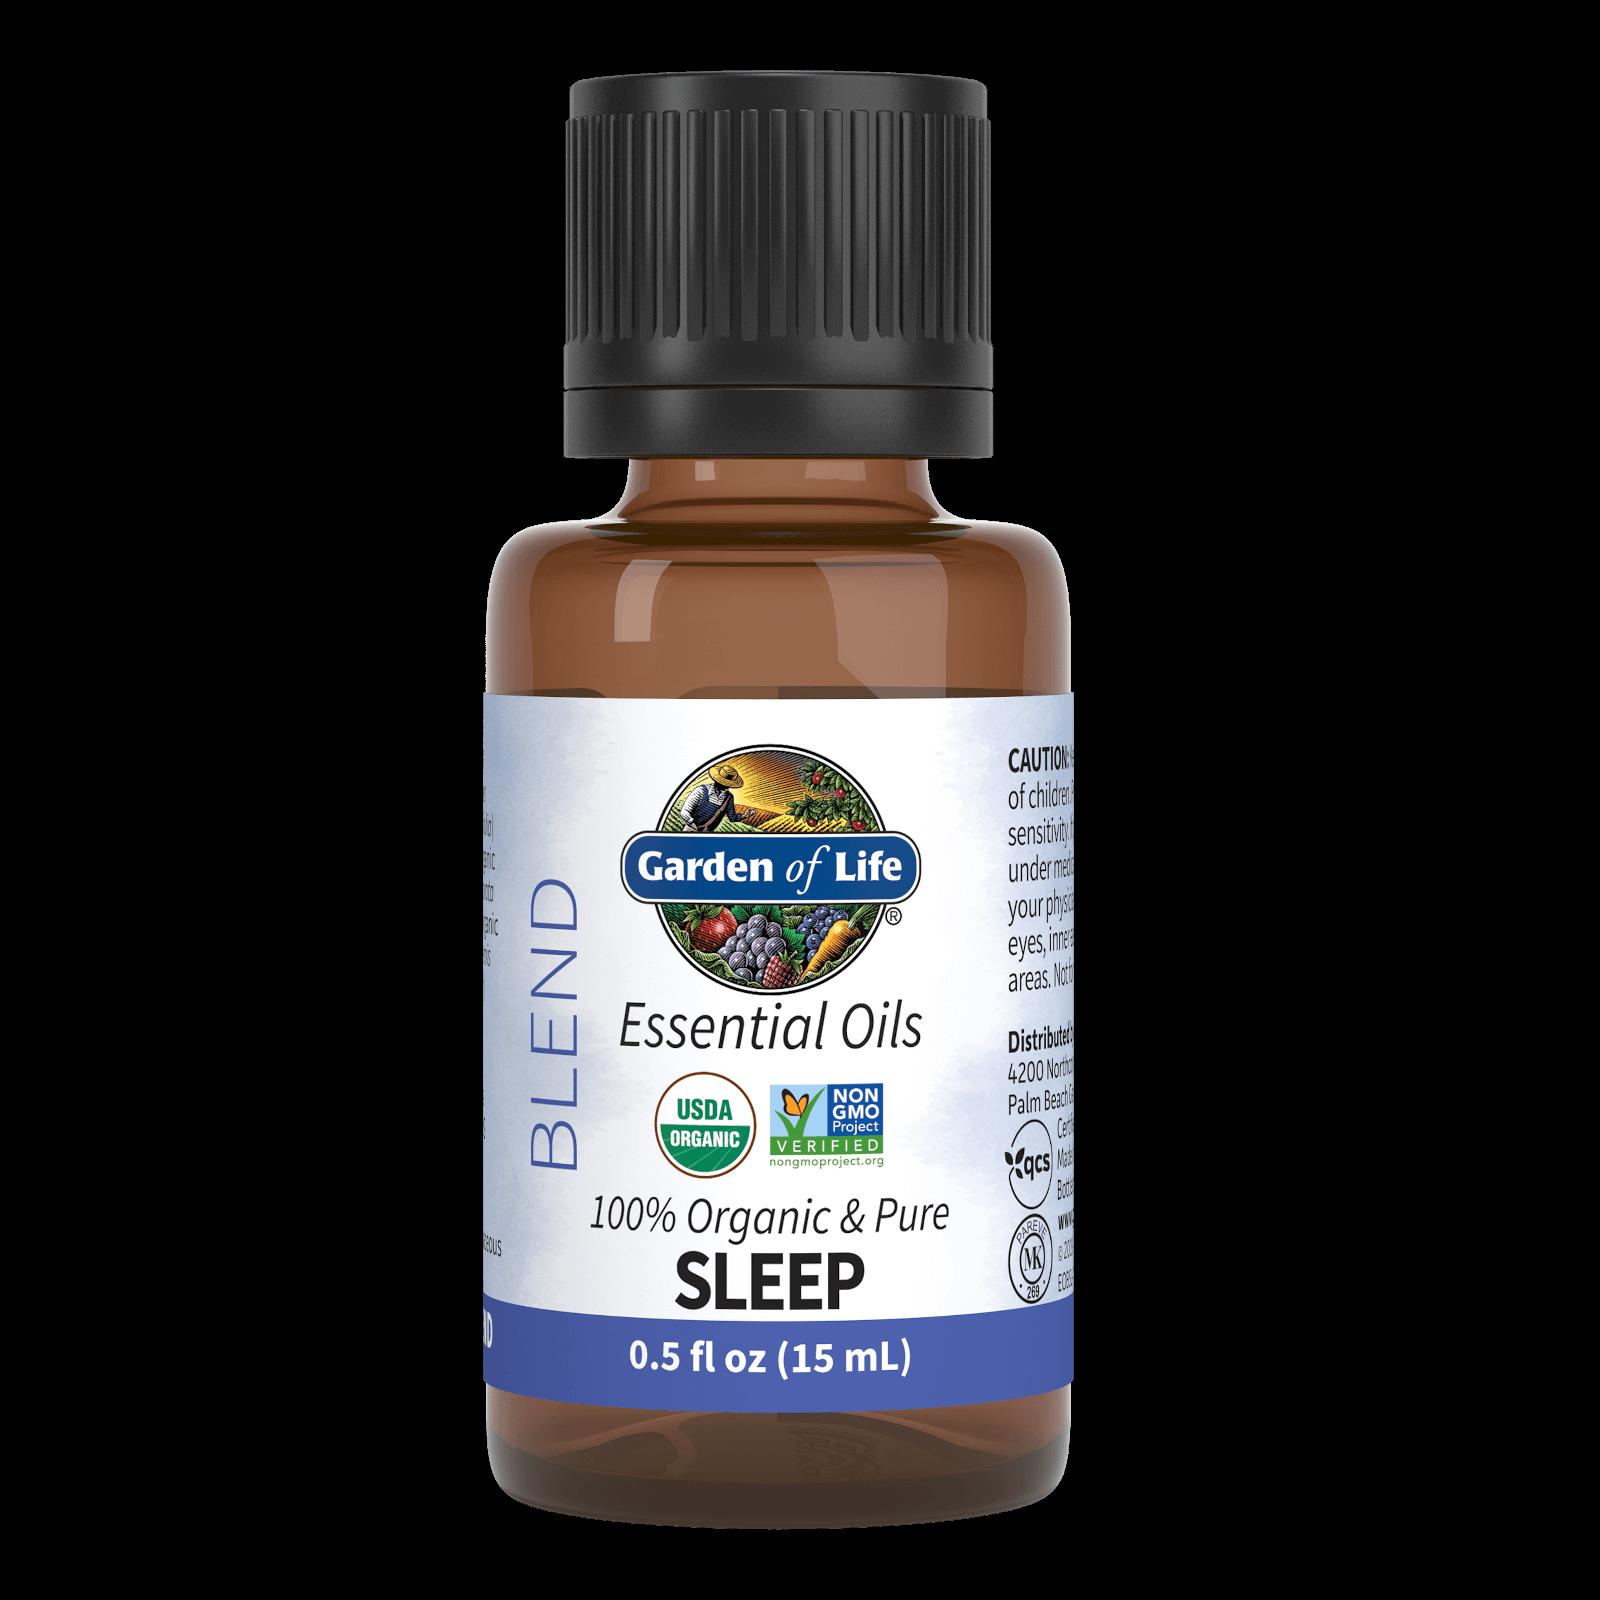 Garden of Life Organic Essential Oil Blend - Sleep - 15ml